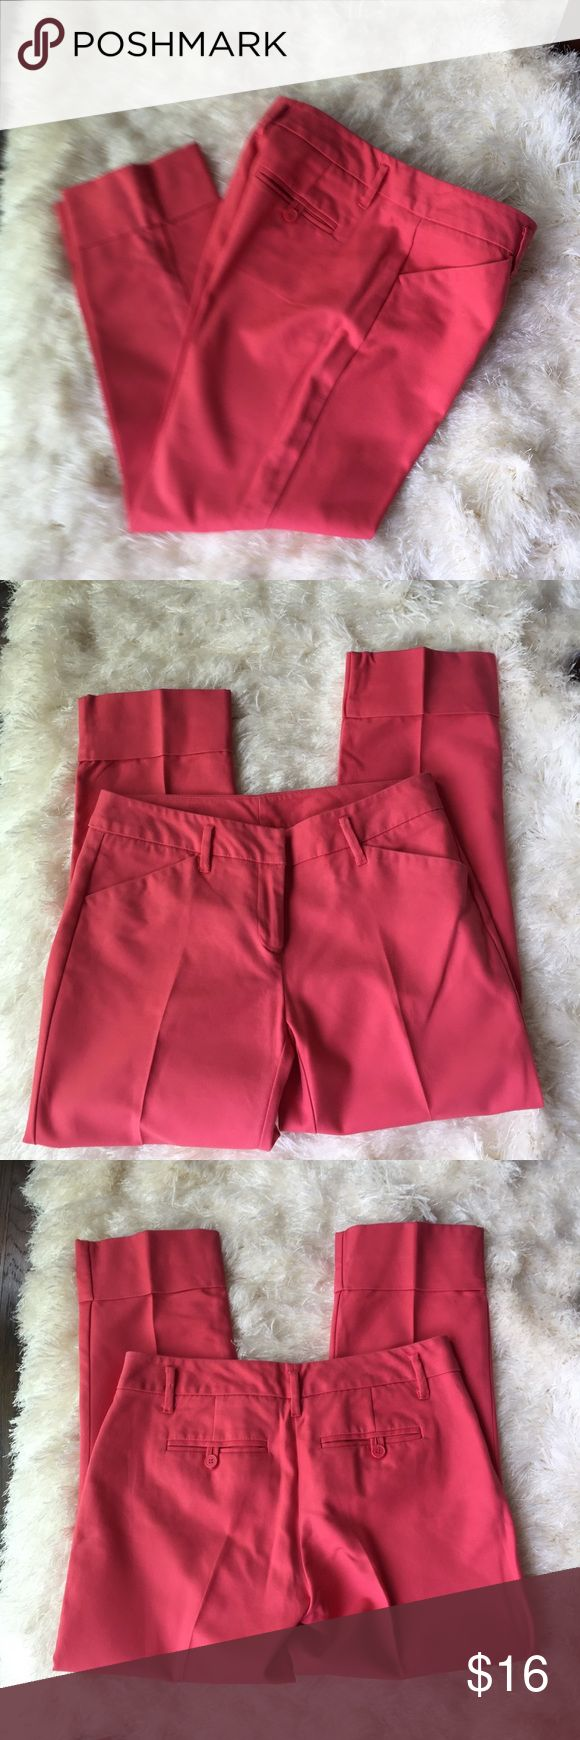 "New York & Co coral capris. Size 2. Vibrant coral capris size 2. Waist measures 30"", inseam is 25"". New York & Company Pants Capris"